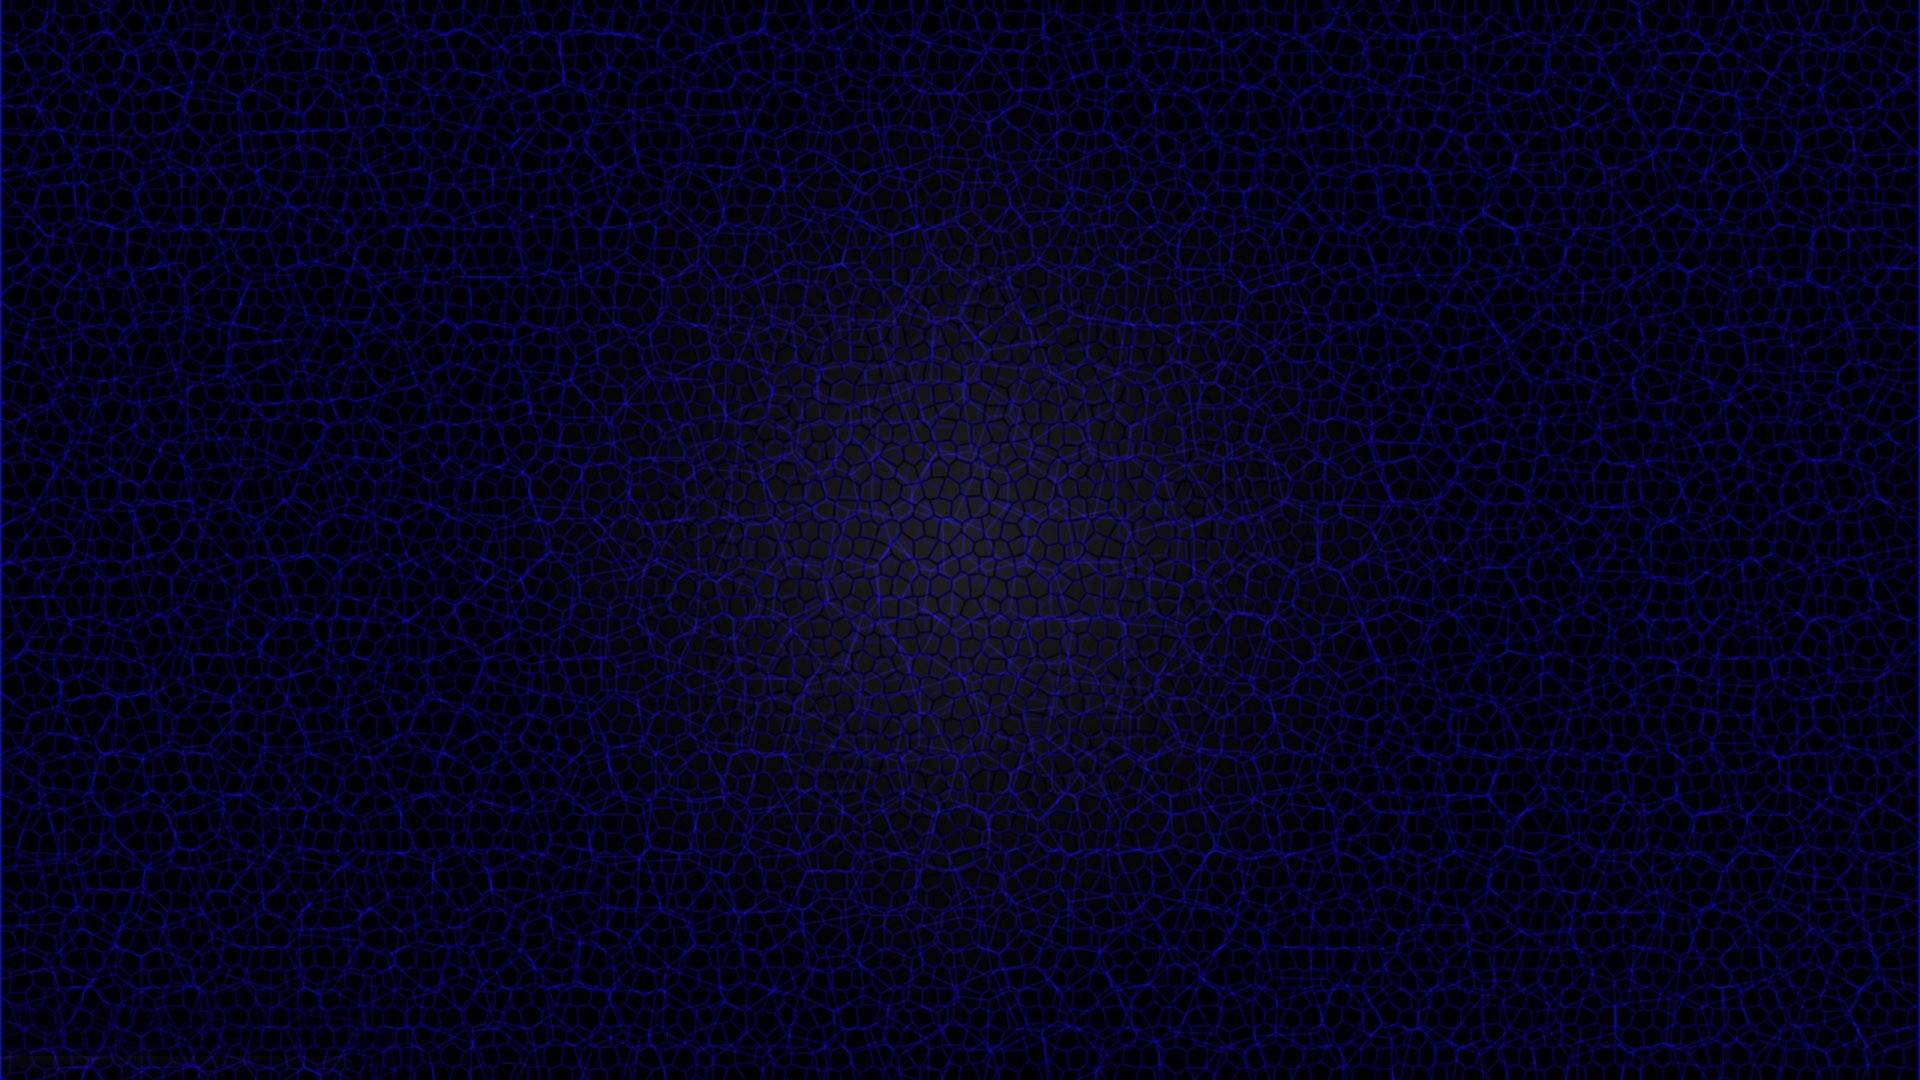 Leather pattern wallpaper 9808 1920x1080